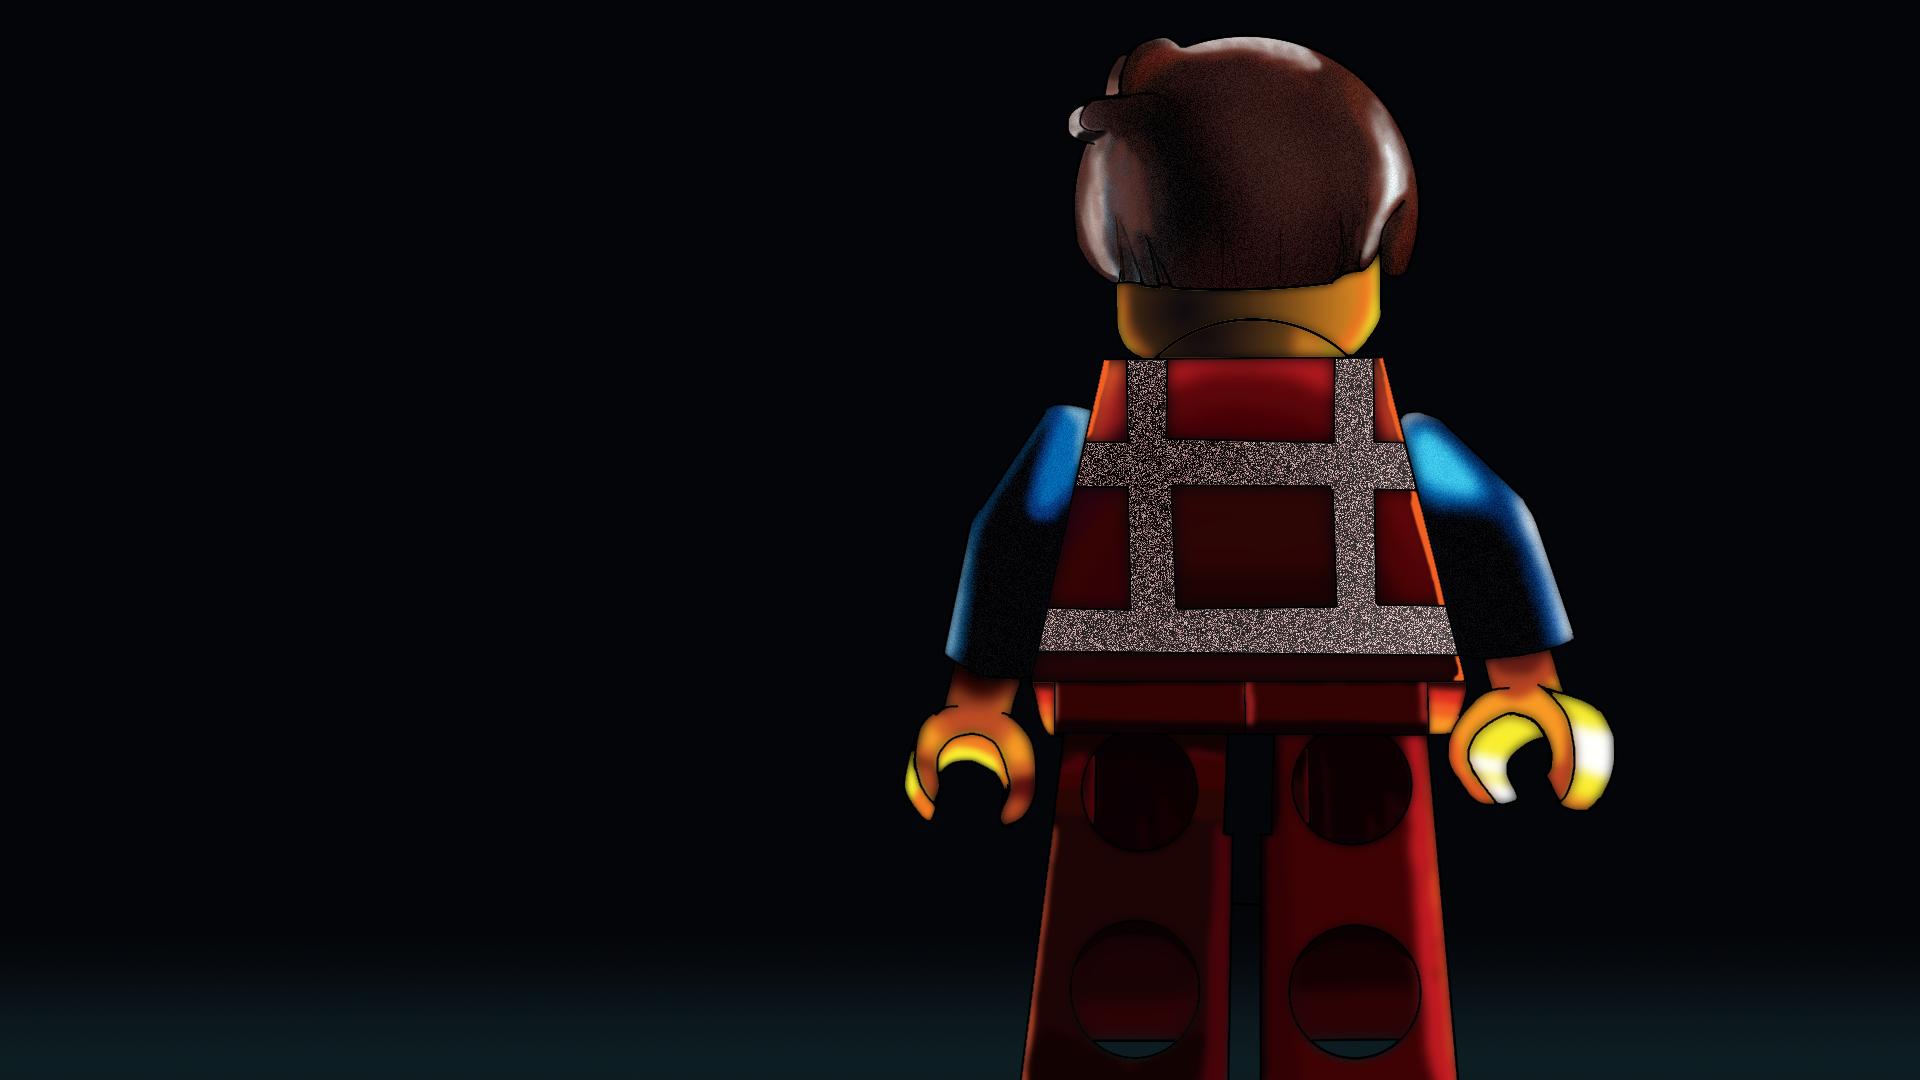 La Grande Aventure Lego Fond Décran Hd Arrière Plan 1920x1080